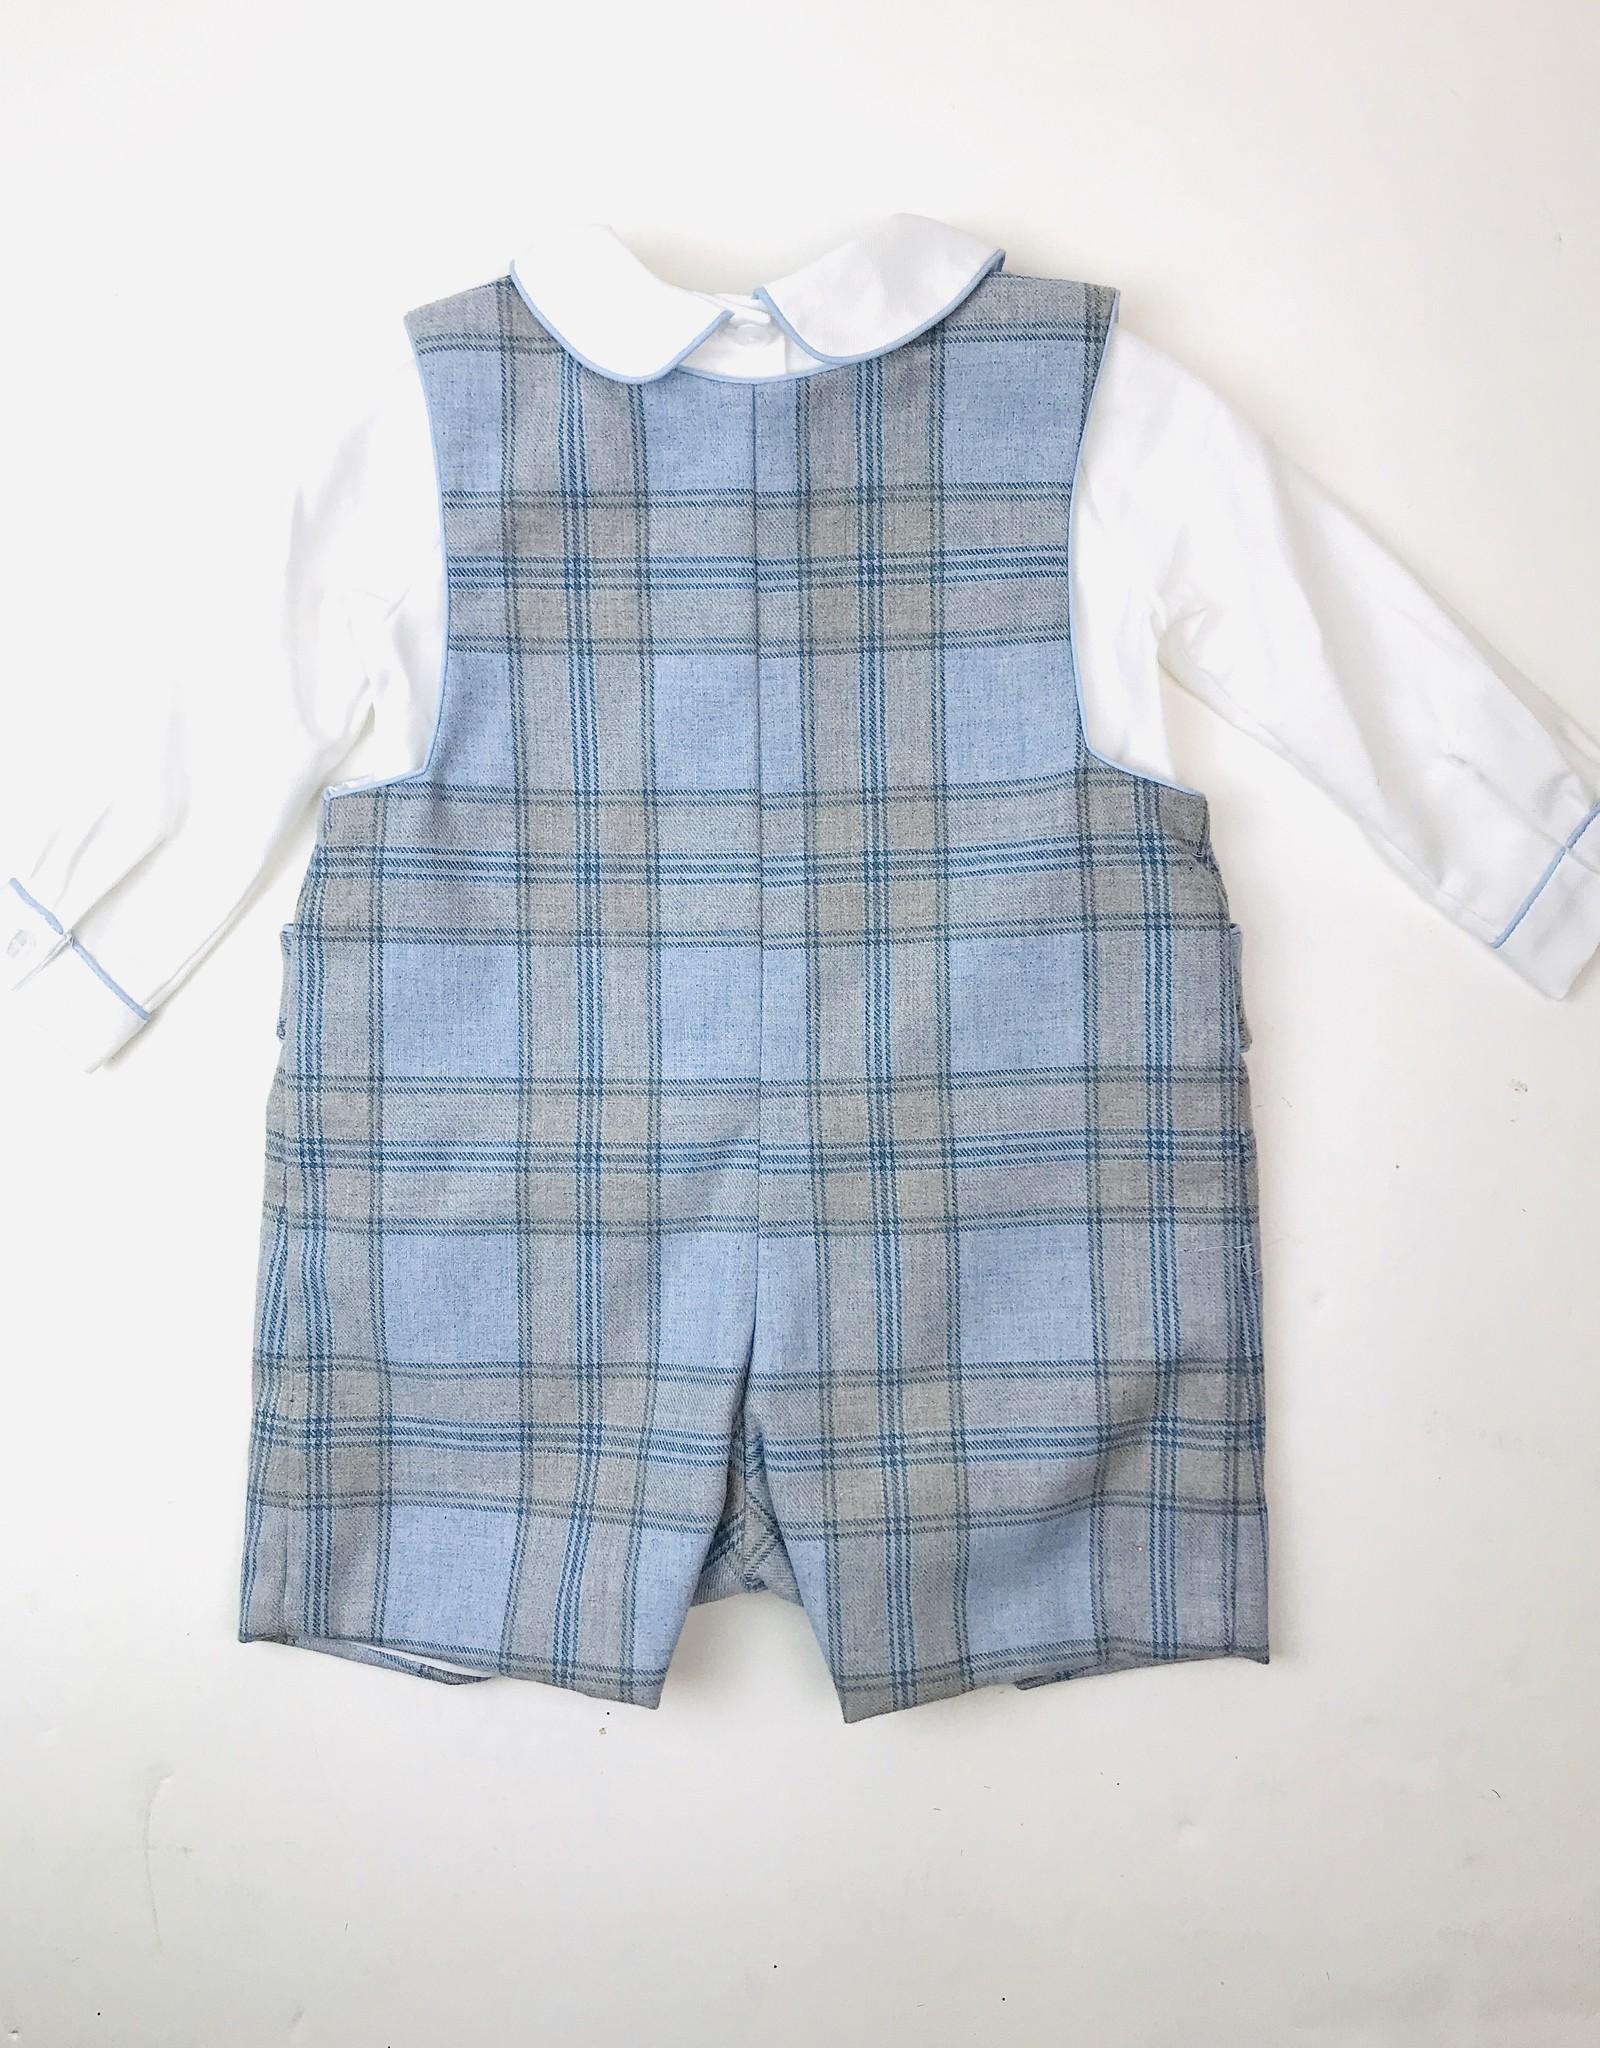 Anavini Little BoysBlue Flannel Plaid Shortall & Shirt